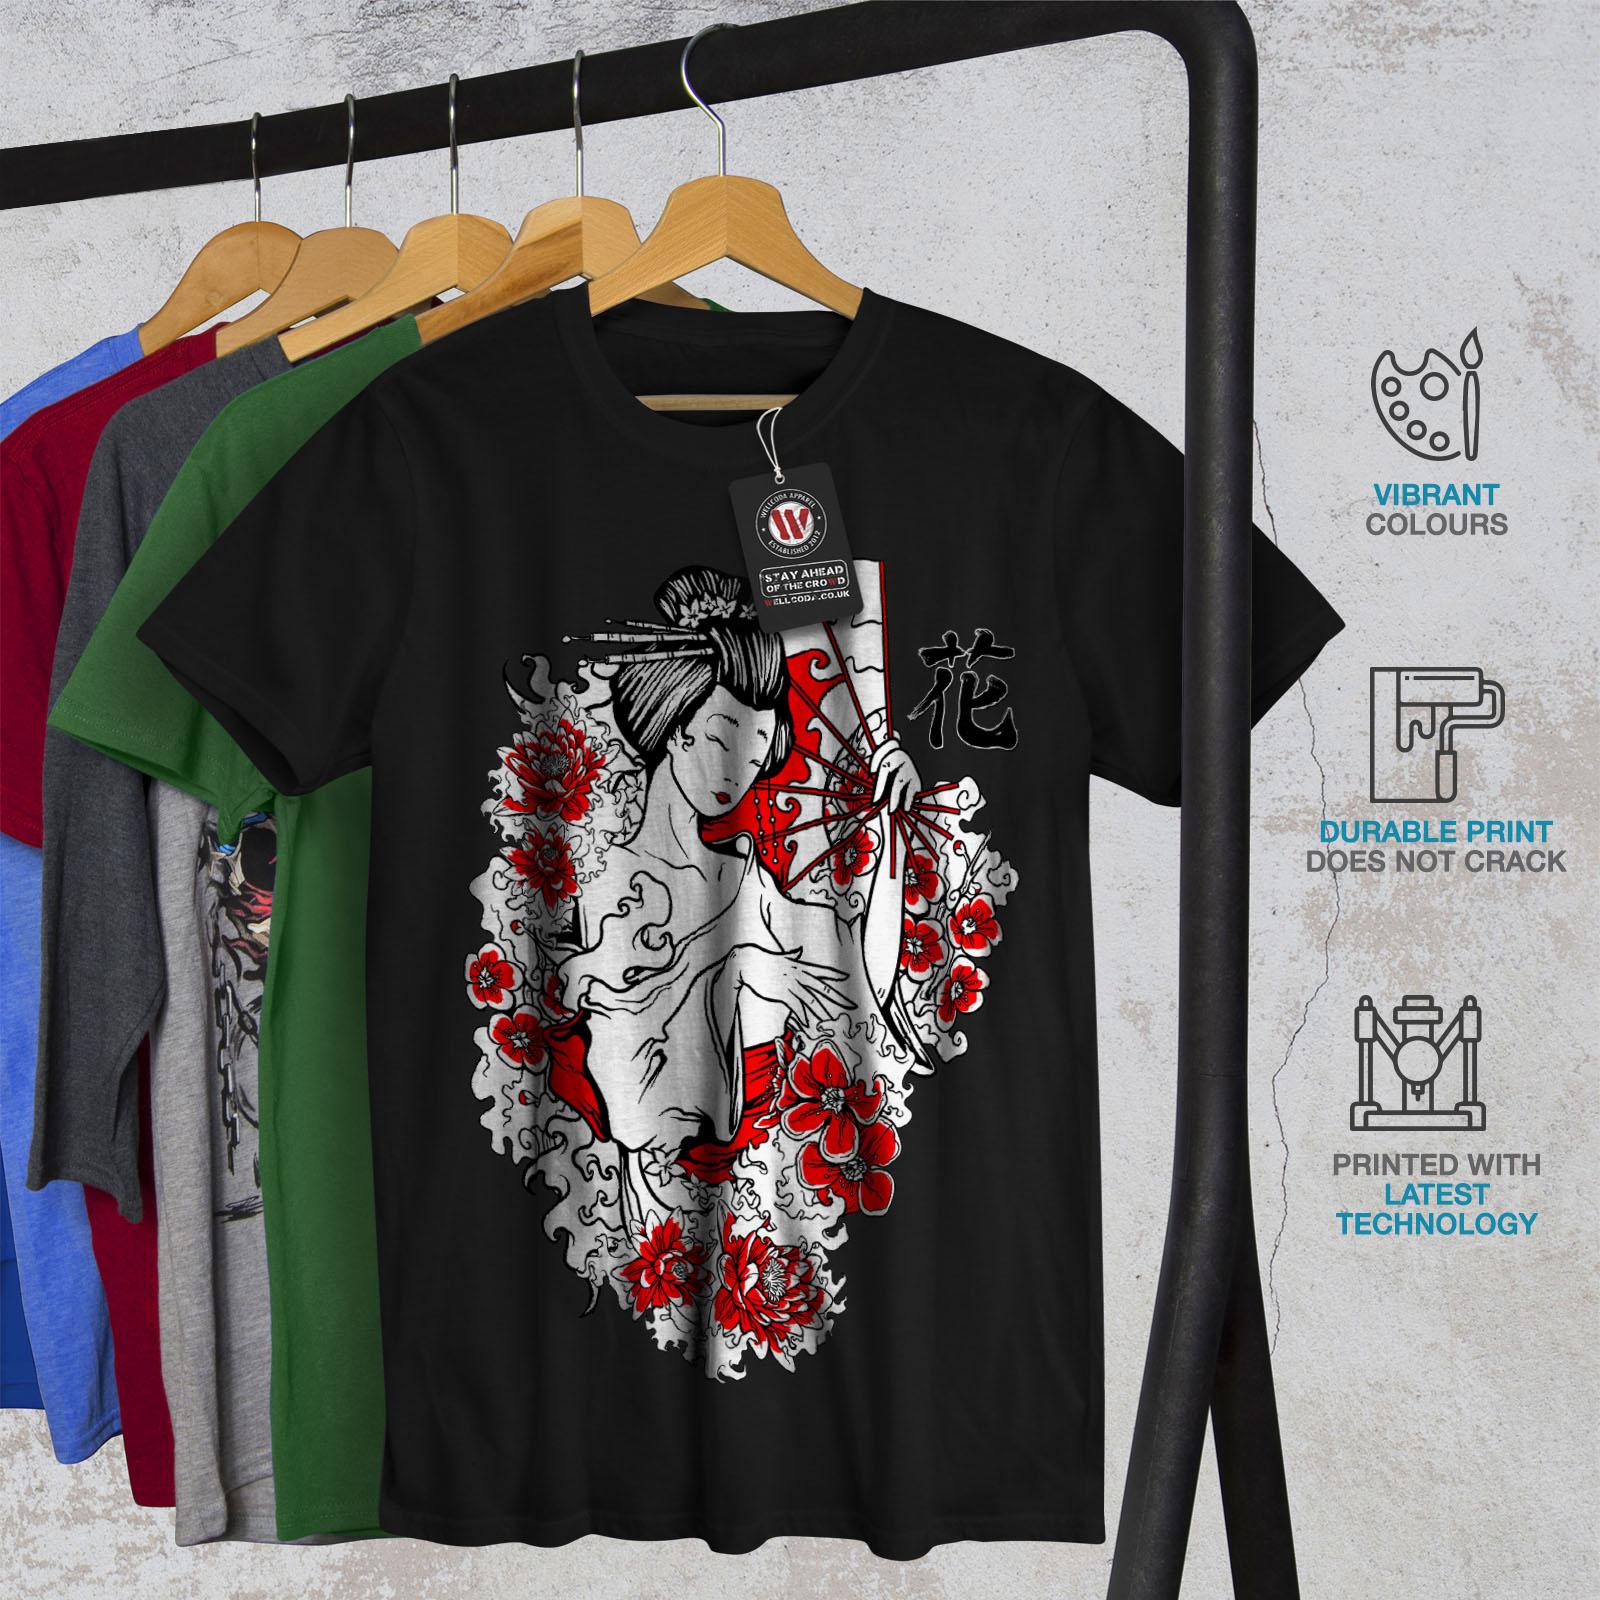 Wellcoda Girl Flower Power Mens T-shirt Japan Graphic Design Printed Tee